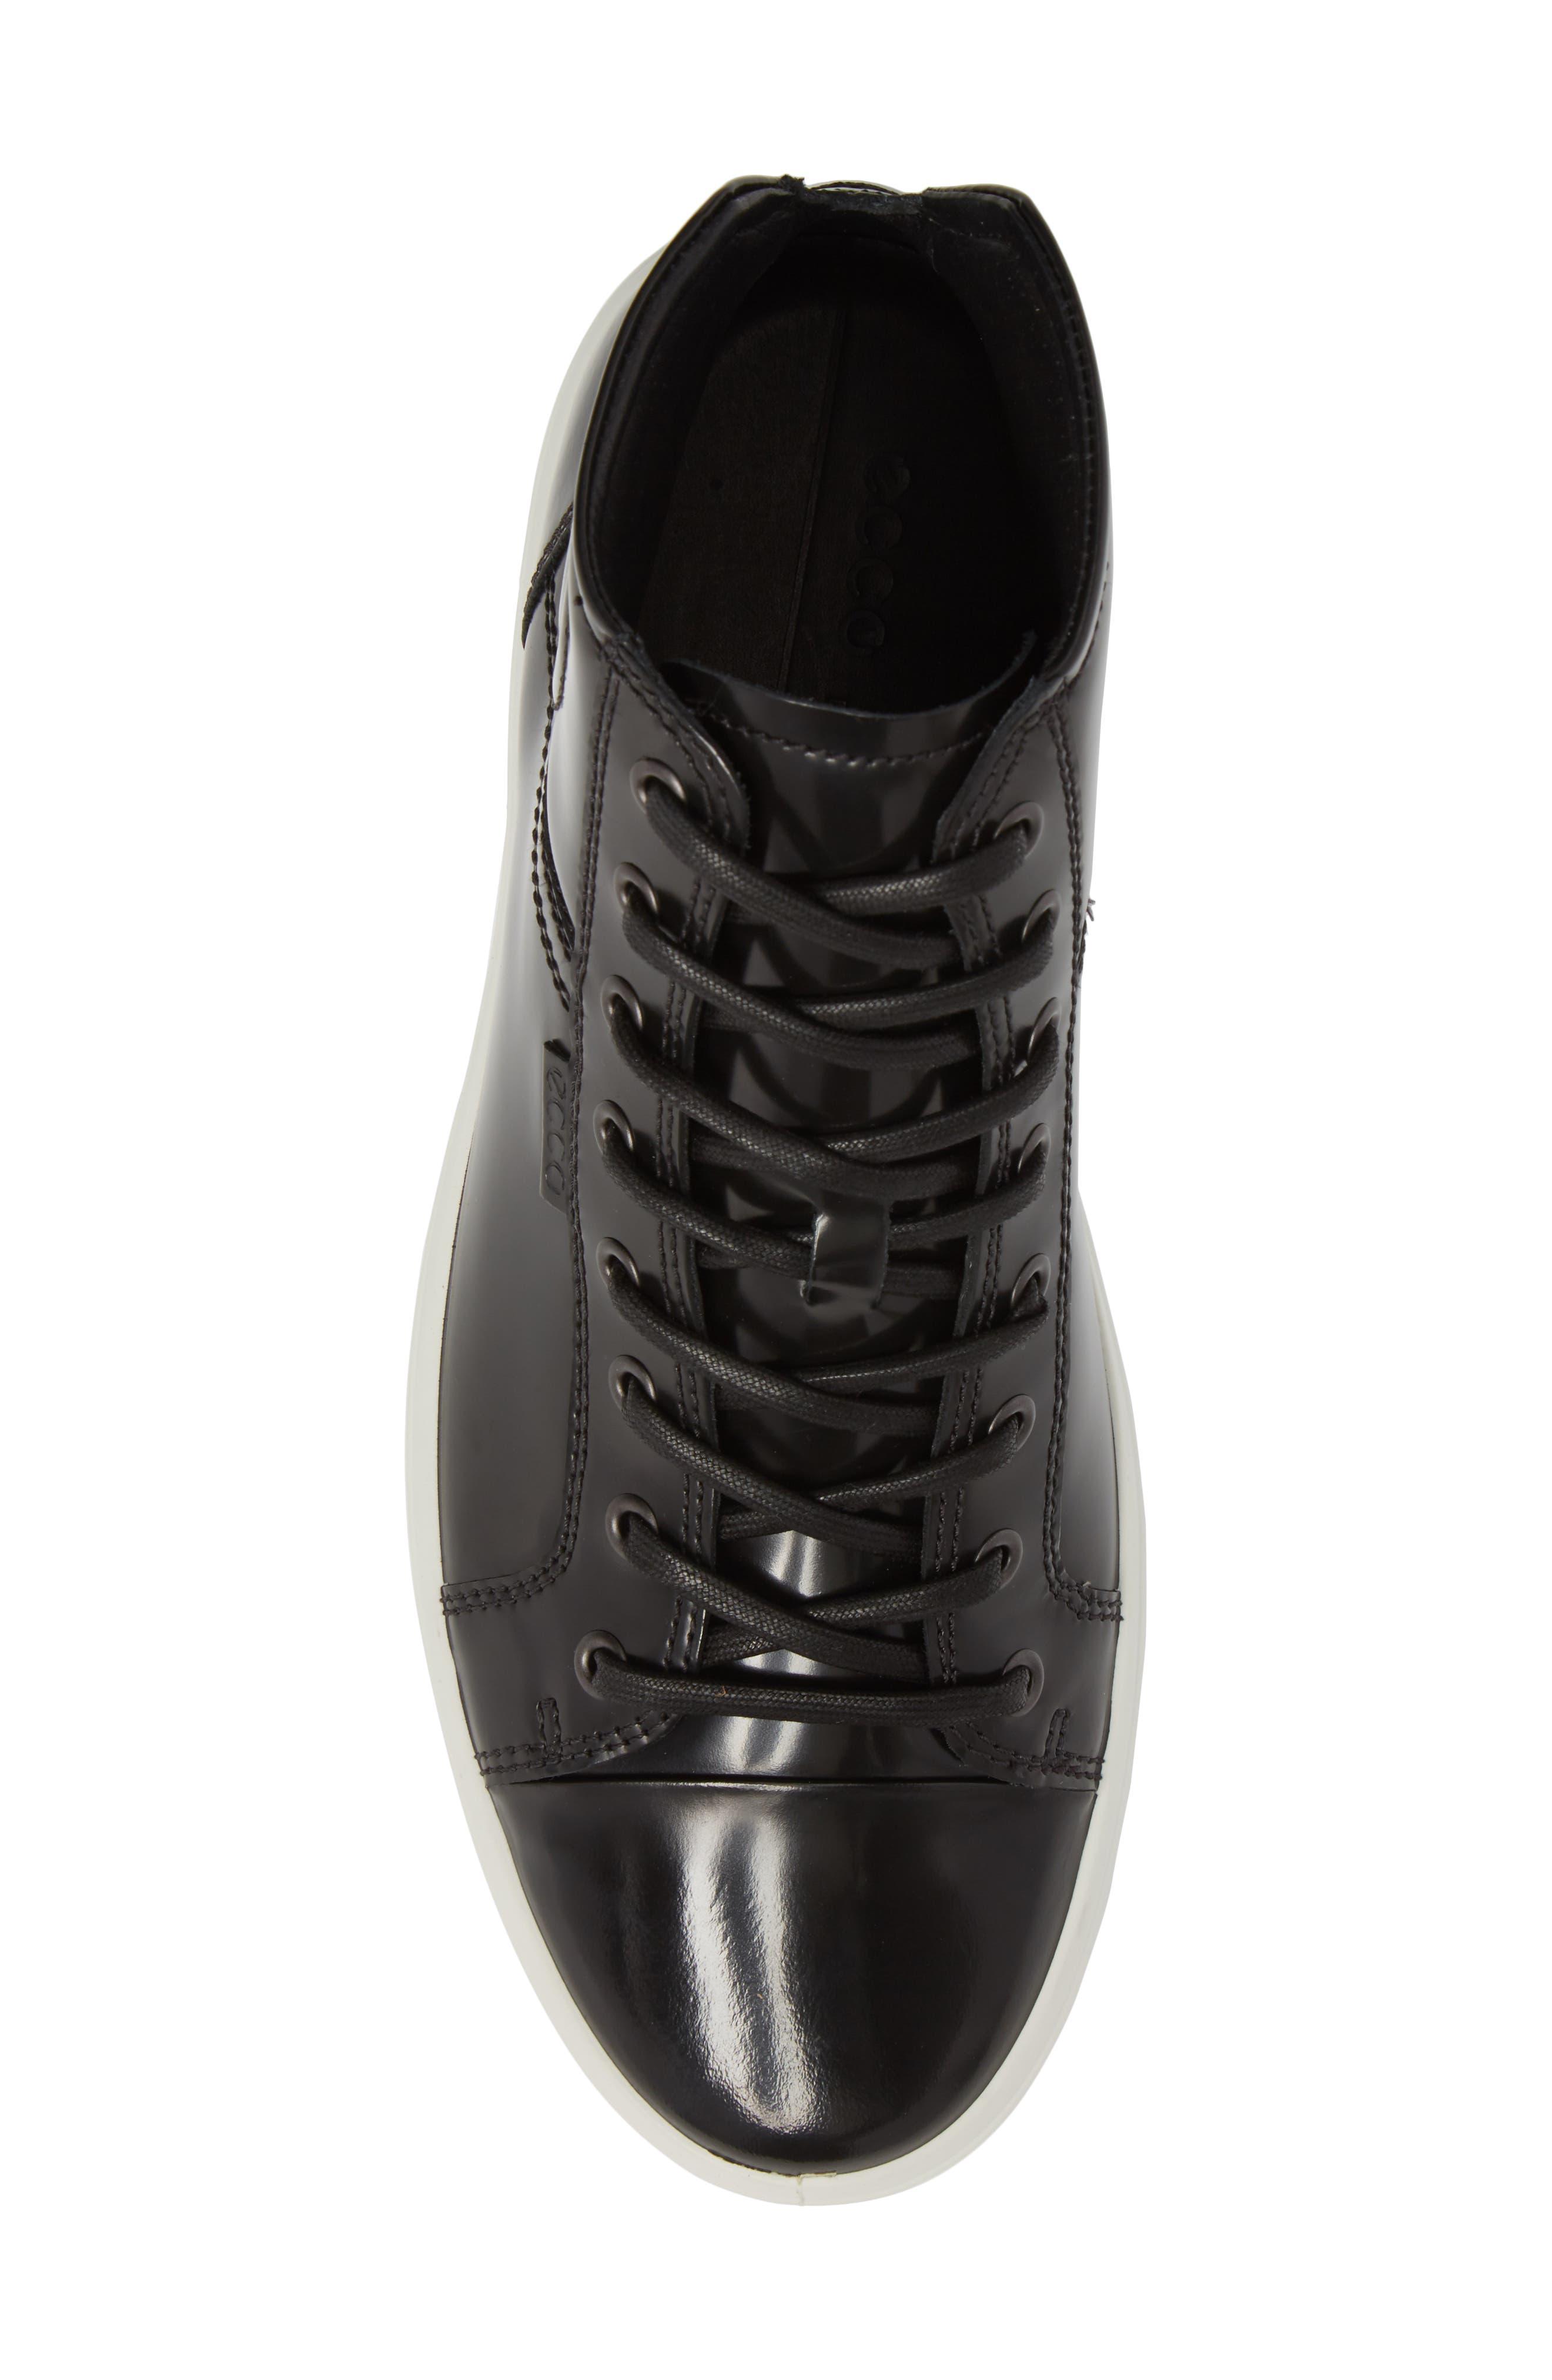 Soft 7 Premium High Top Sneaker,                             Alternate thumbnail 5, color,                             009